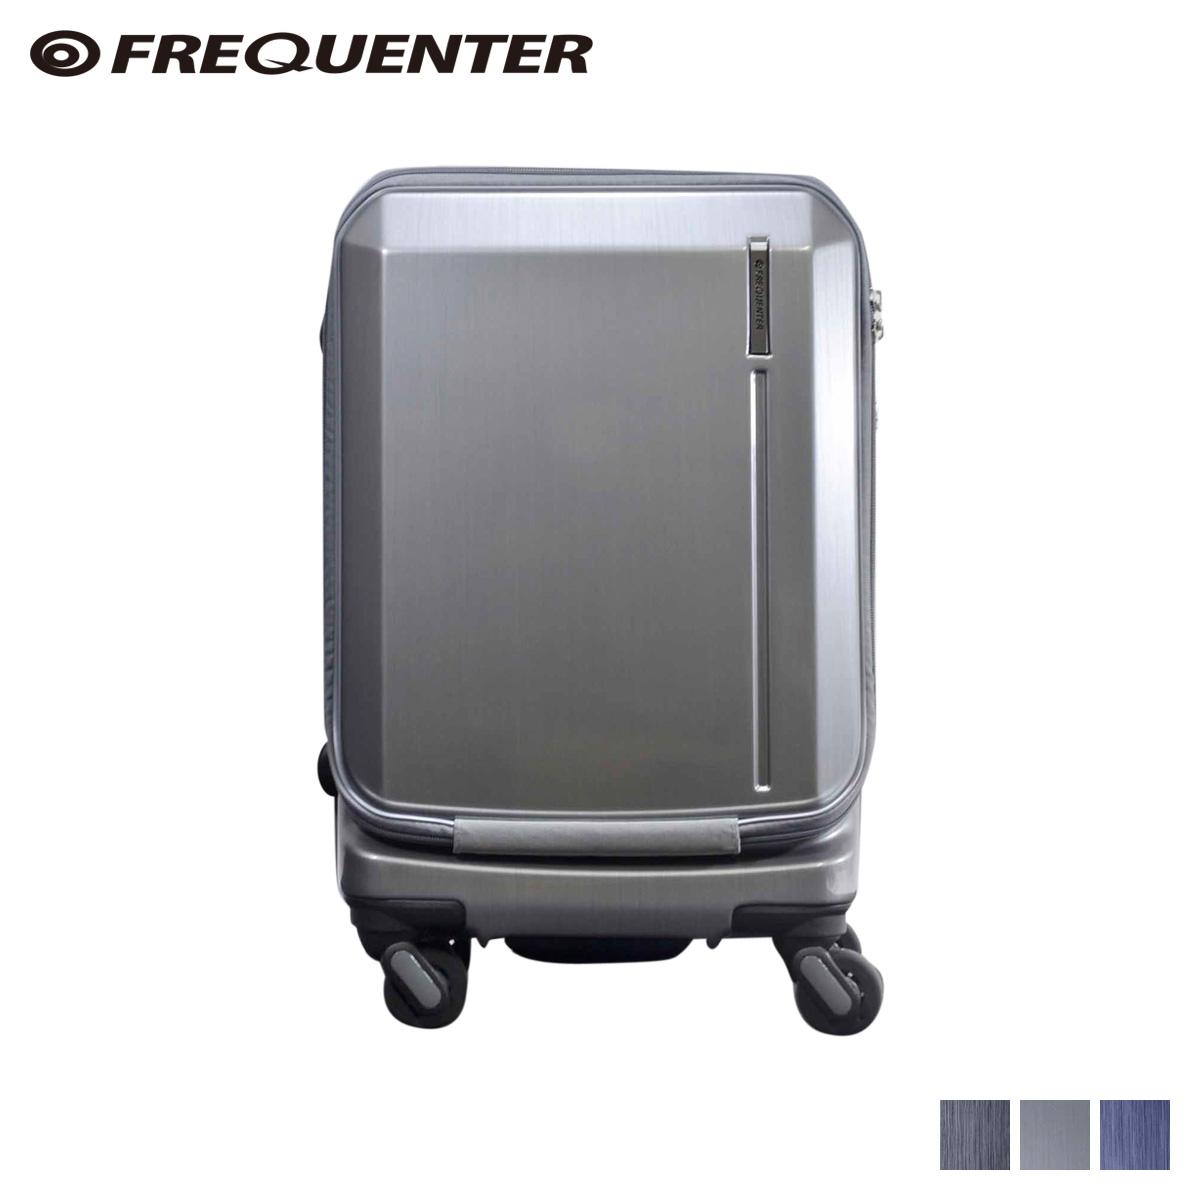 FREQUENTER フリクエンター グランド スーツケース キャリーケース キャリーバッグ メンズ 34L GRAND ブラック グレー ネイビー 黒 1-360 [4/13 新入荷]